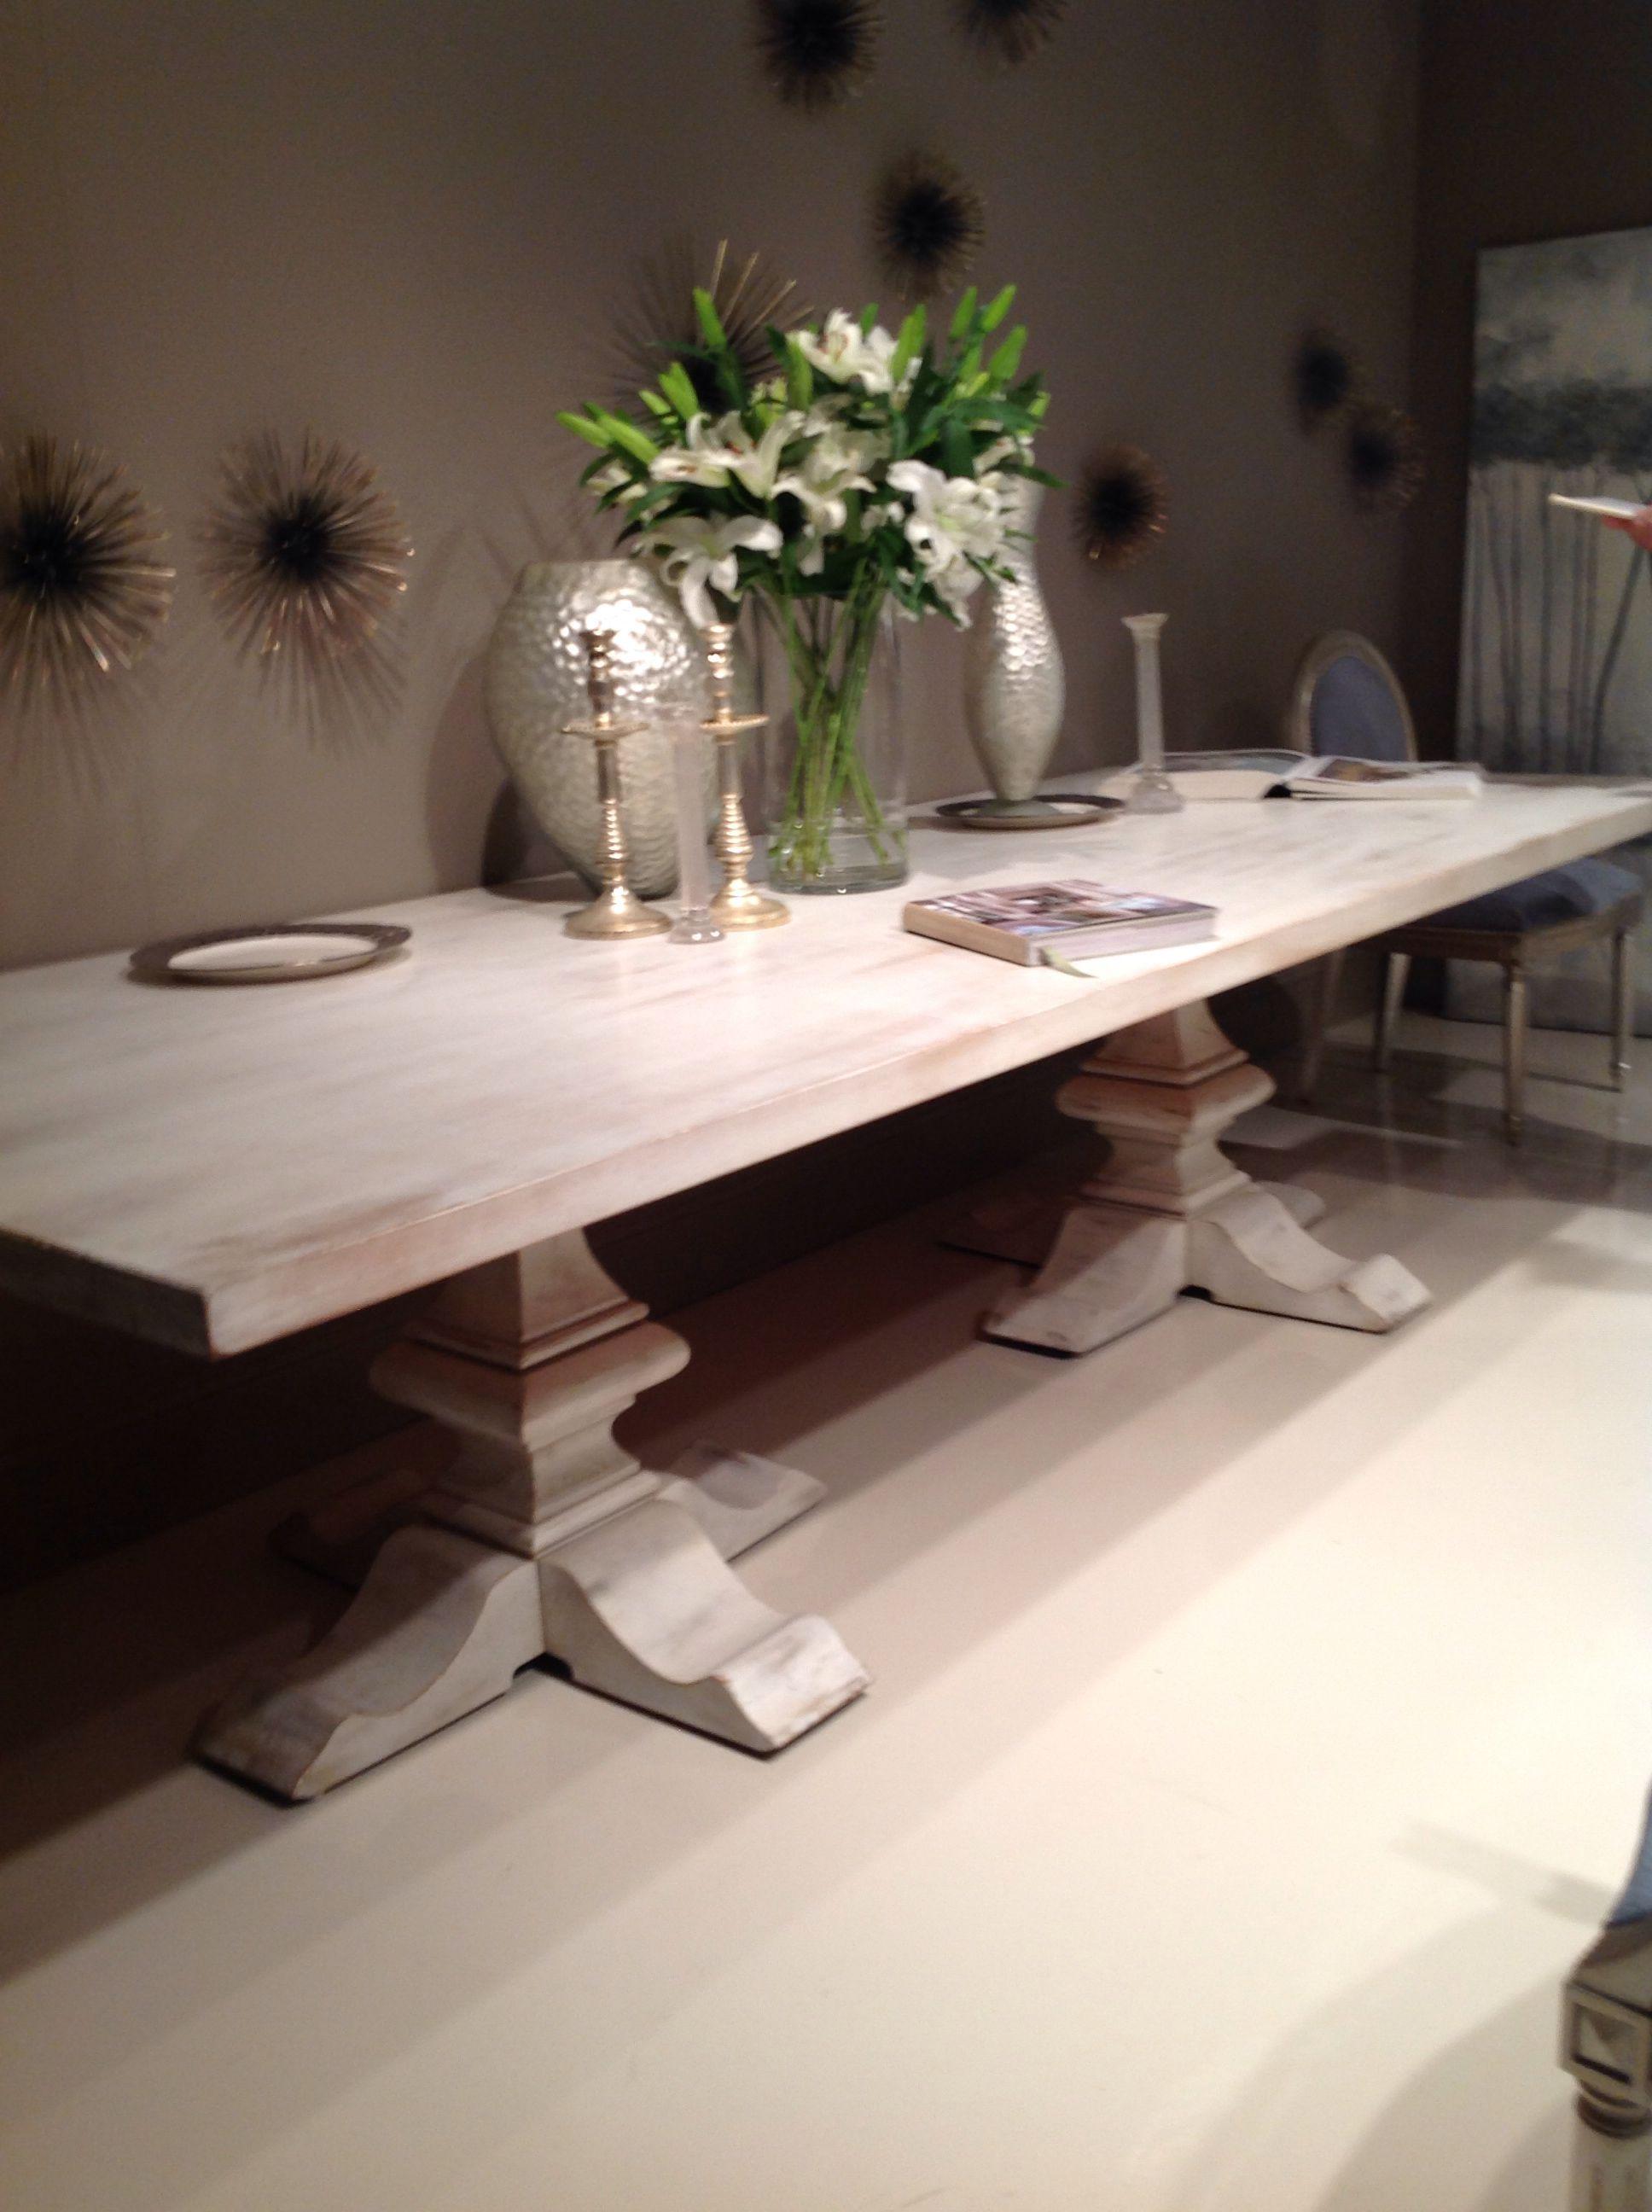 Mesa cool de madera blanca patinada | Mesas ratonas | Pinterest ...